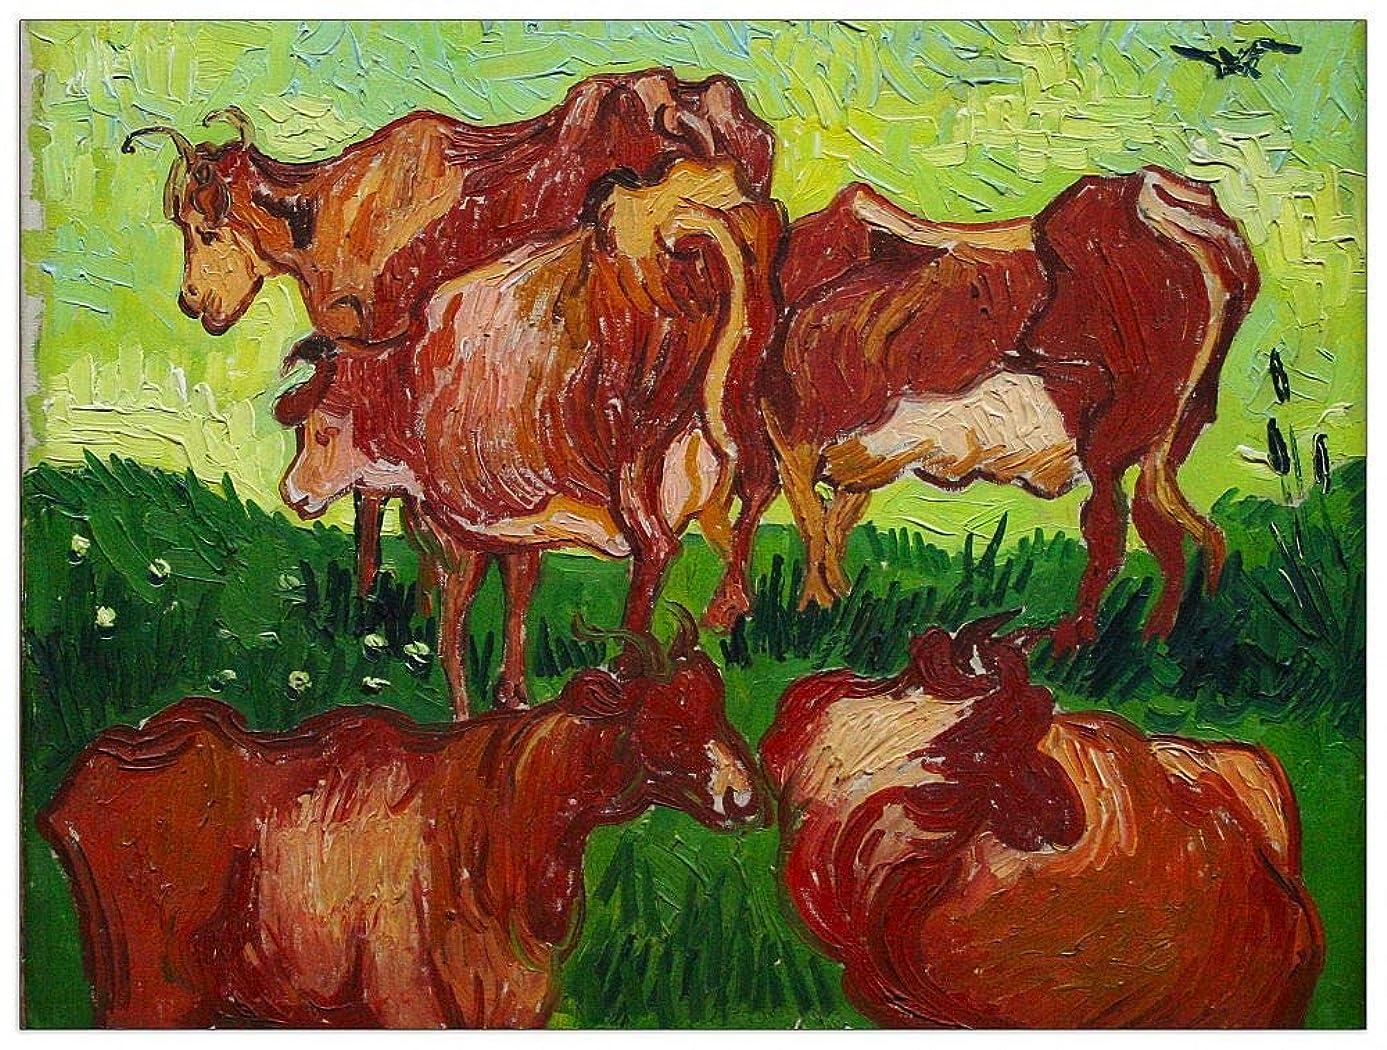 ArtPlaza TW90724 Van Gogh Vincent - Les Vaches Decorative Panel 35.5x27.5 Inch Multicolored